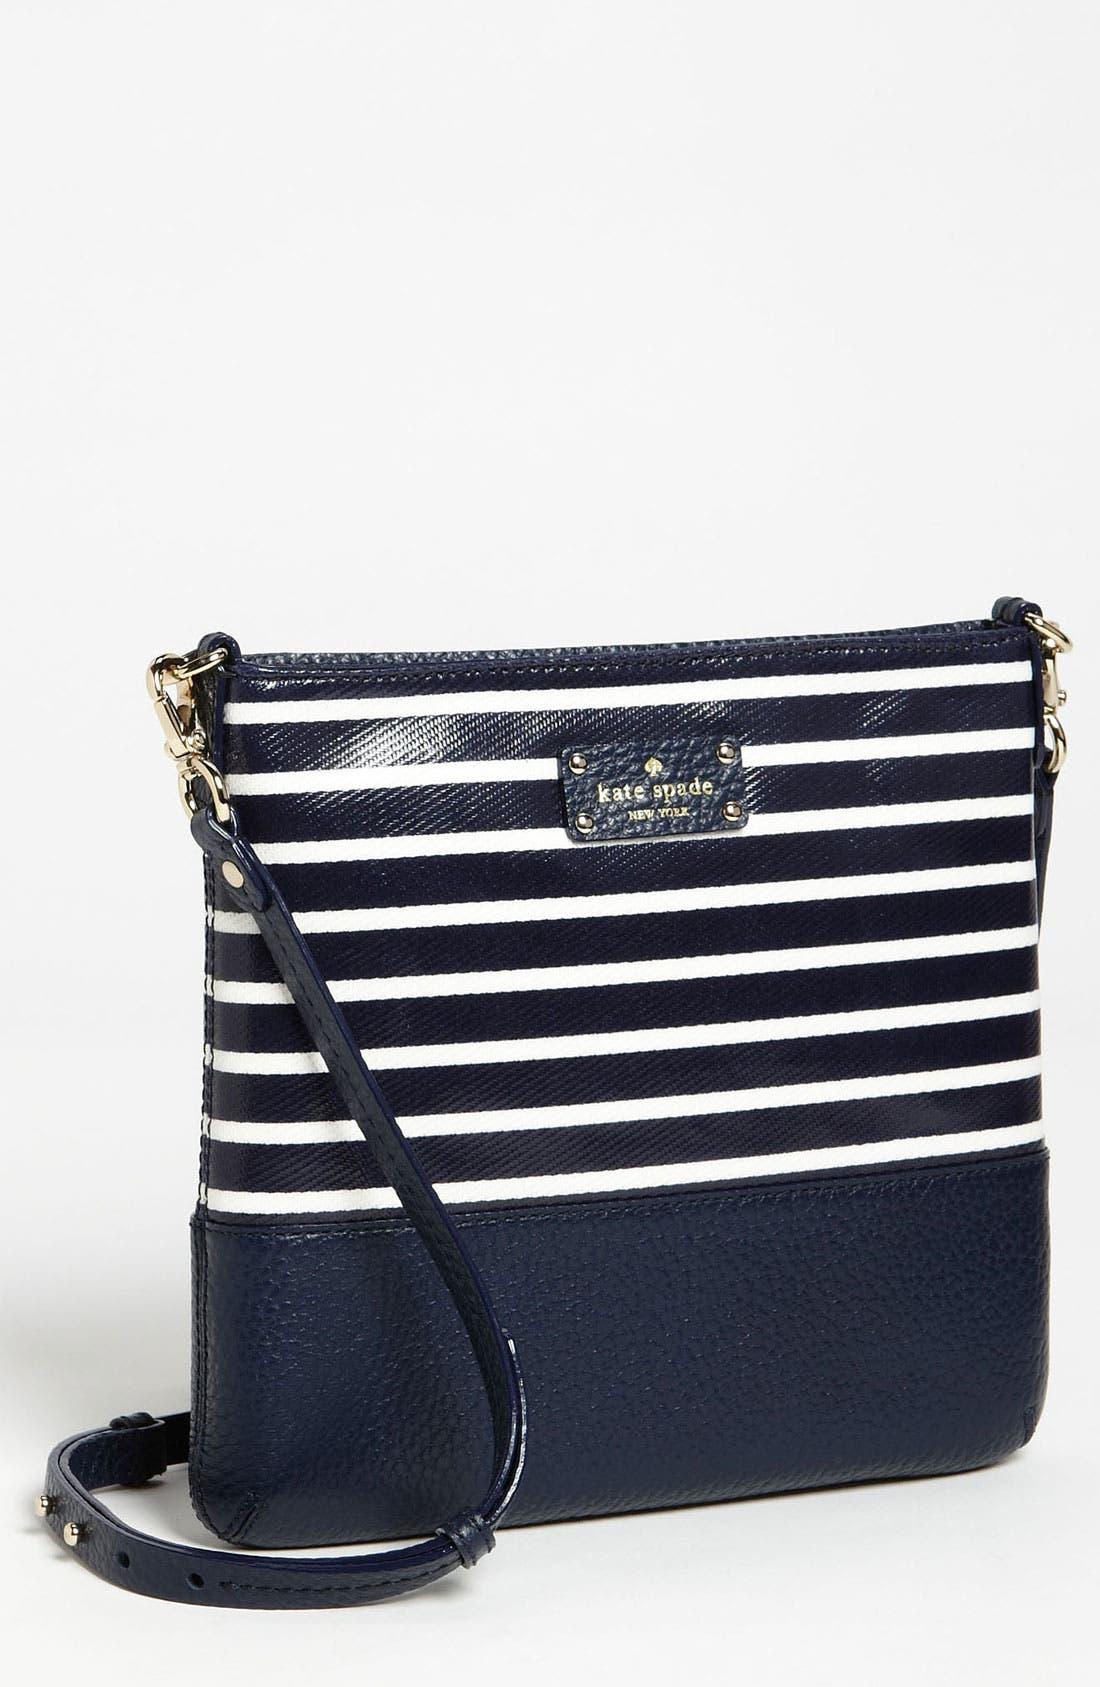 Main Image - kate spade new york 'grove court stripe - cora' crossbody bag